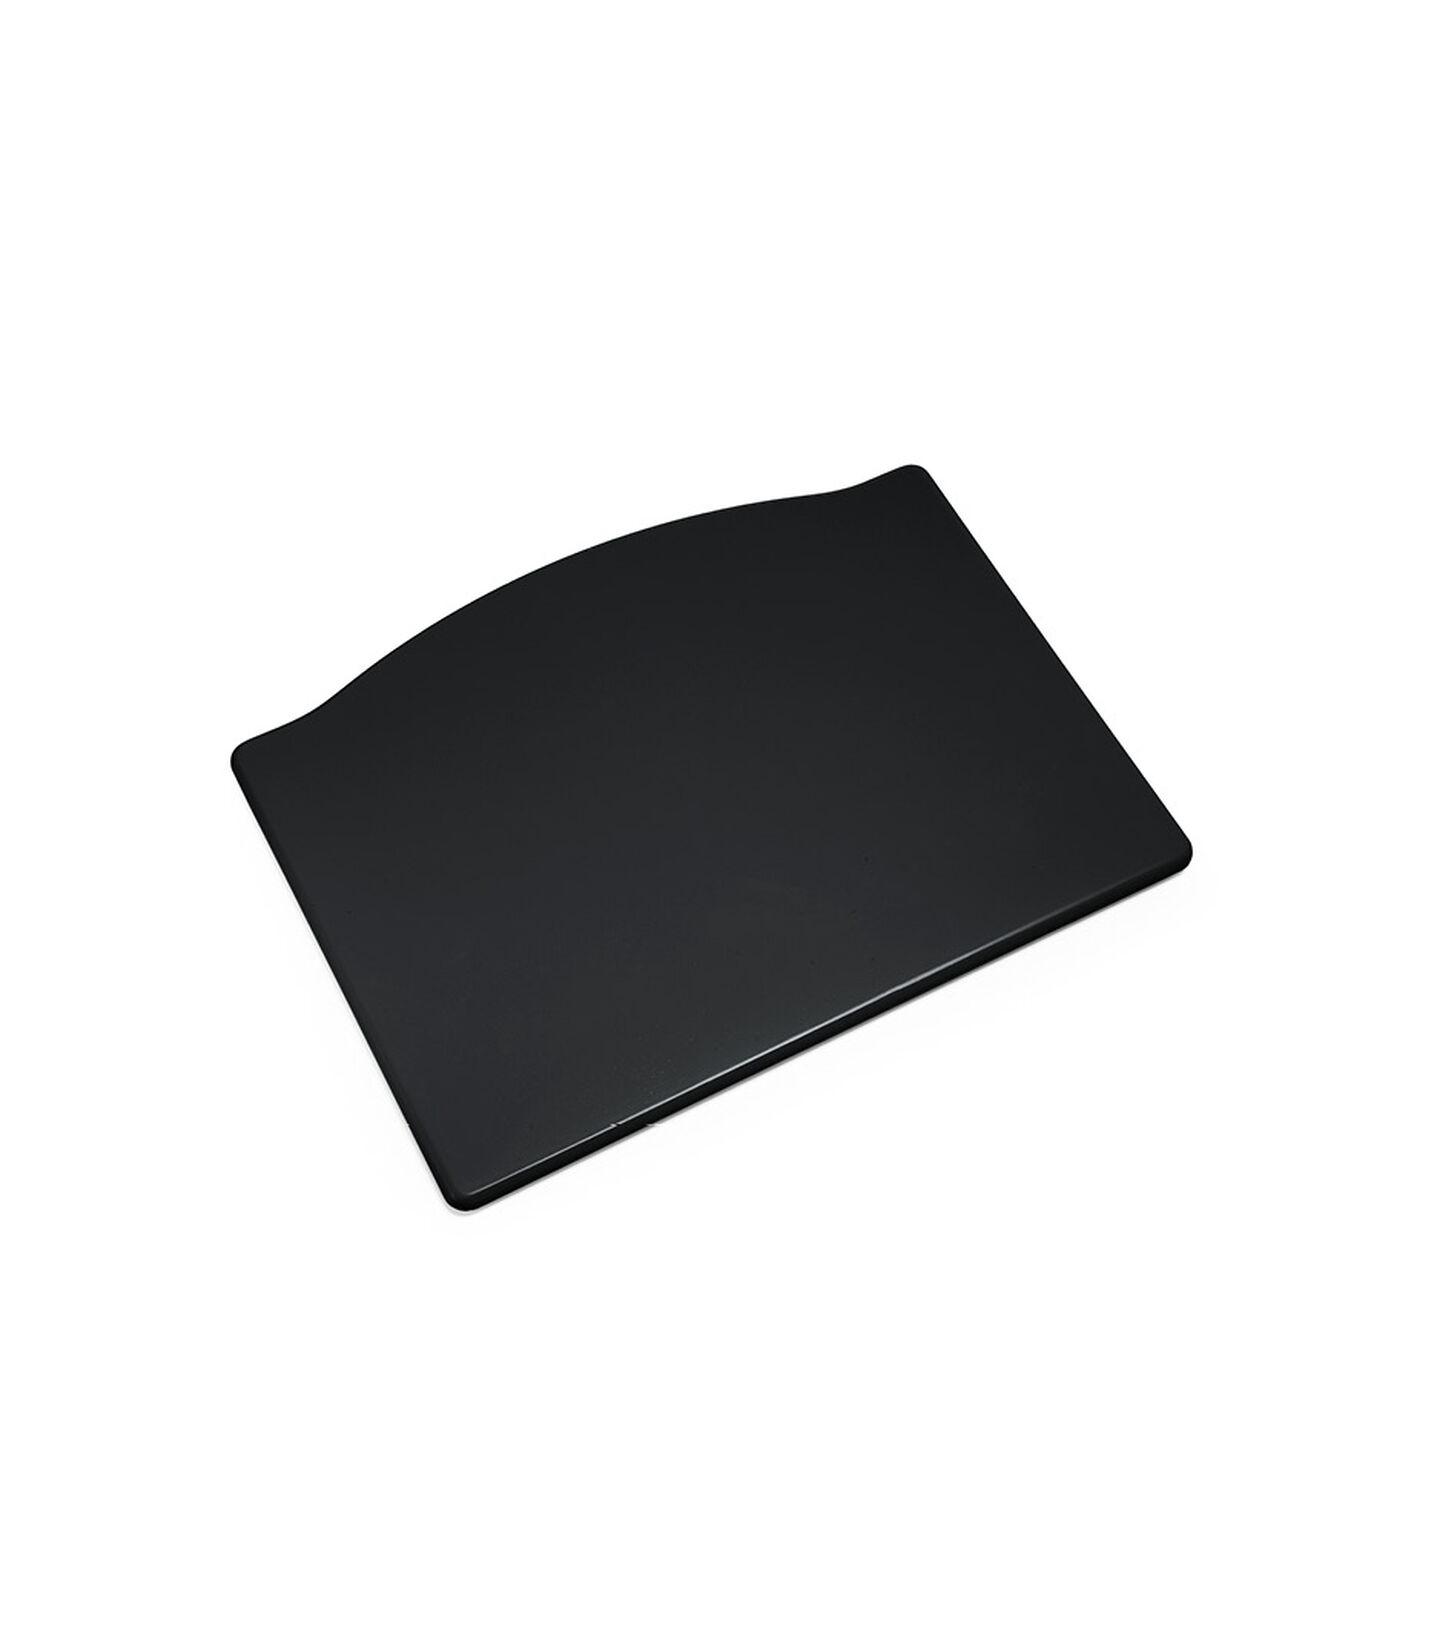 Tripp Trapp® Footplate Black, Black, mainview view 1